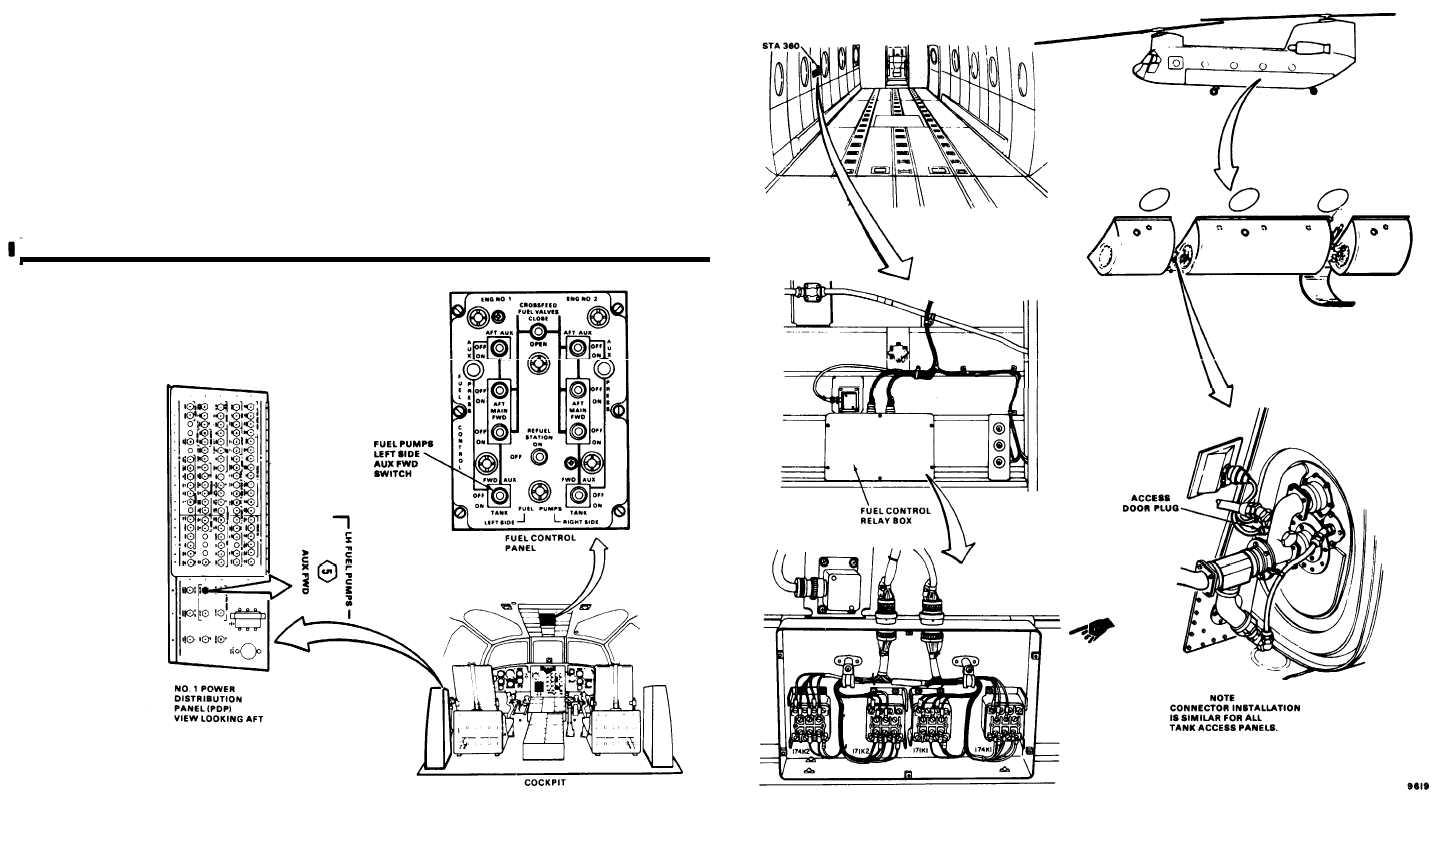 main circuit breaker page 3